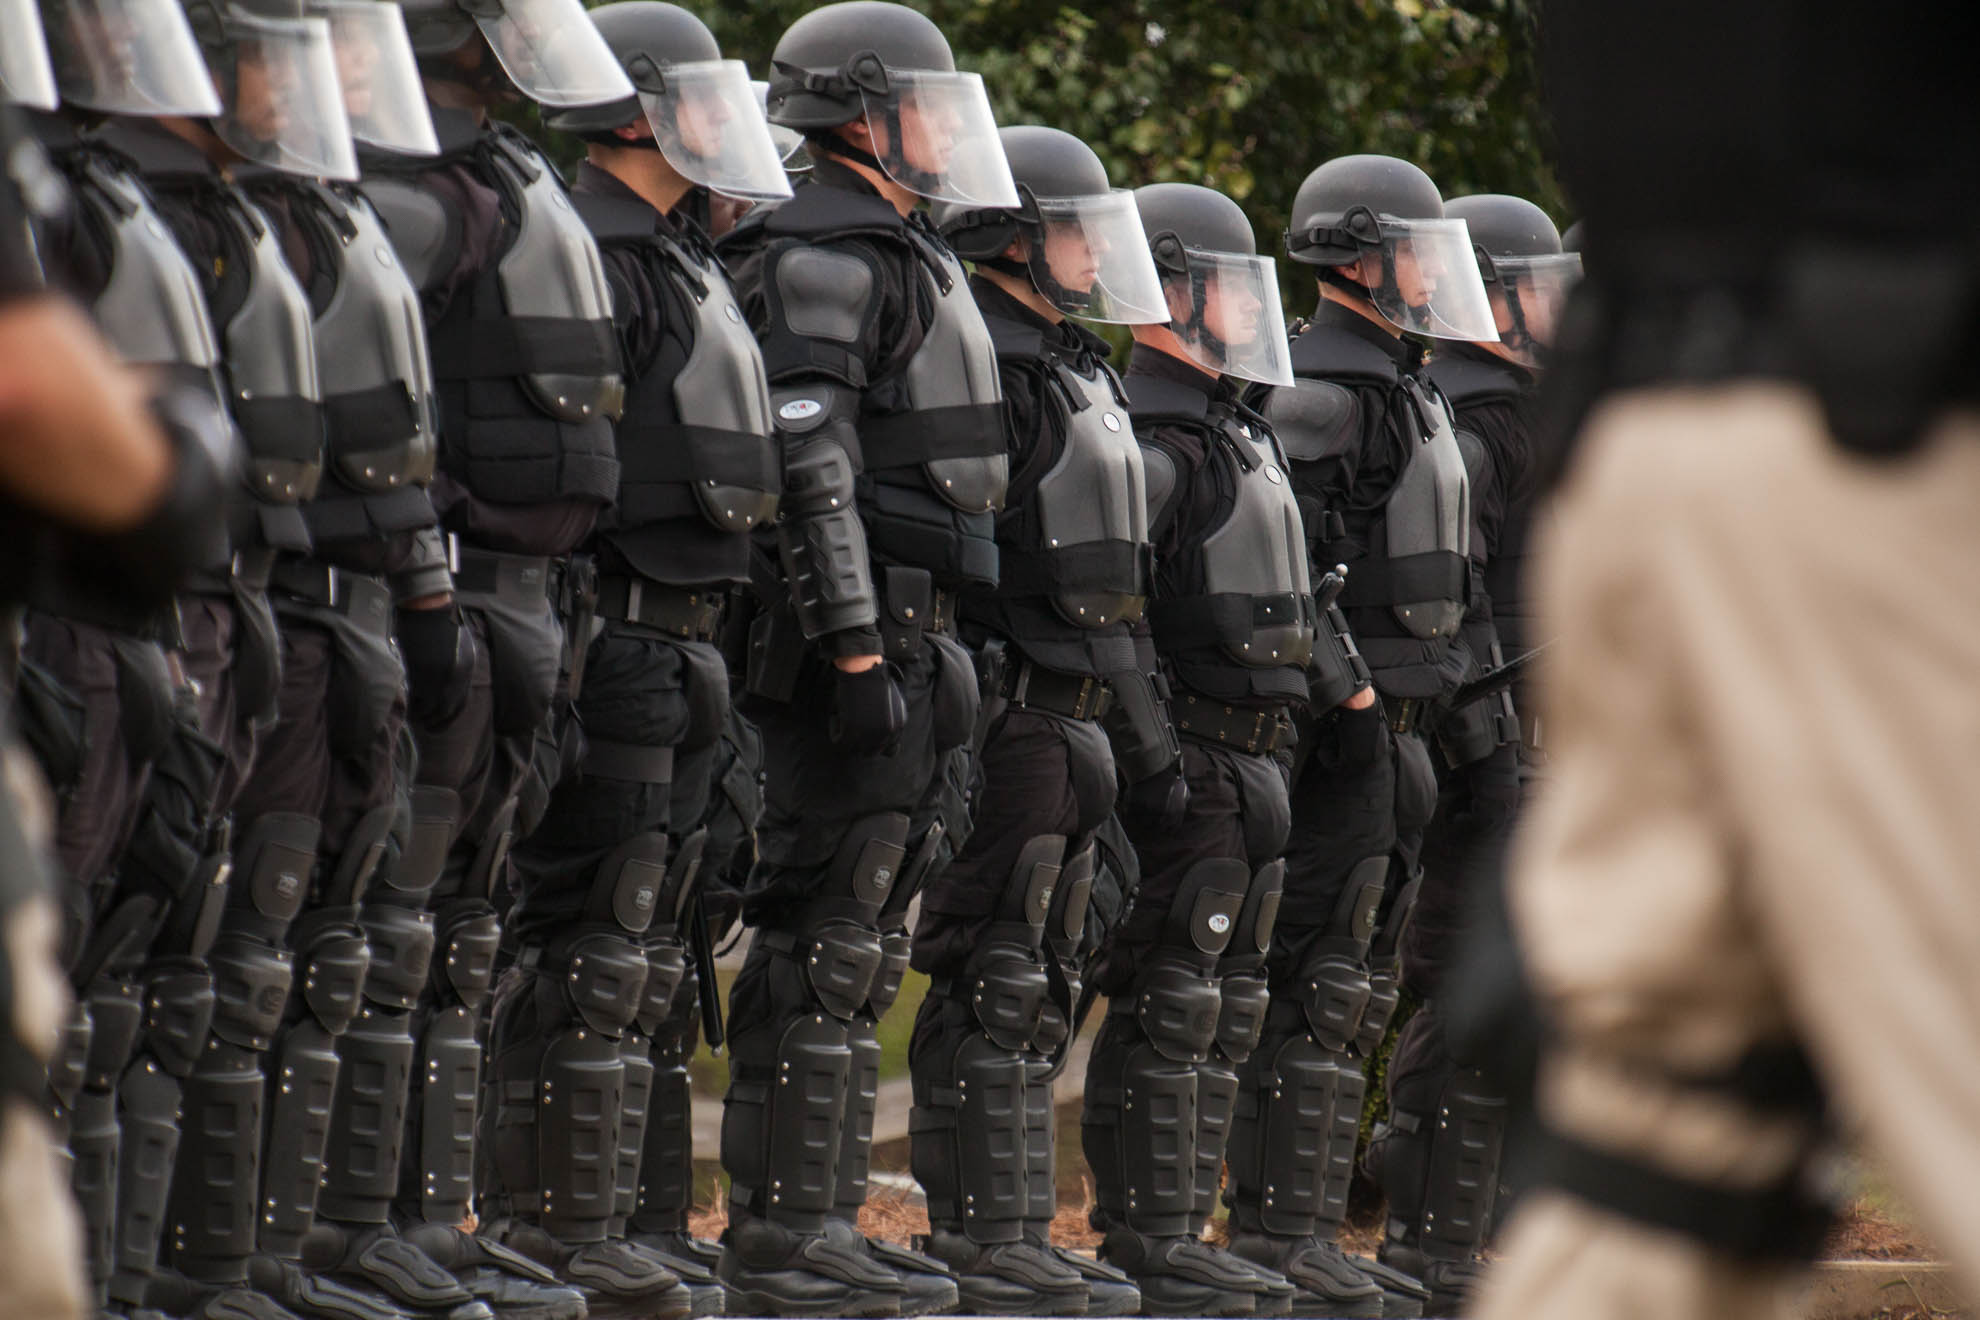 death penalty, photography, photos, execution, prison, documentary, troy davis, innocent, georgia, police, SWAT, riot, protest, vigil